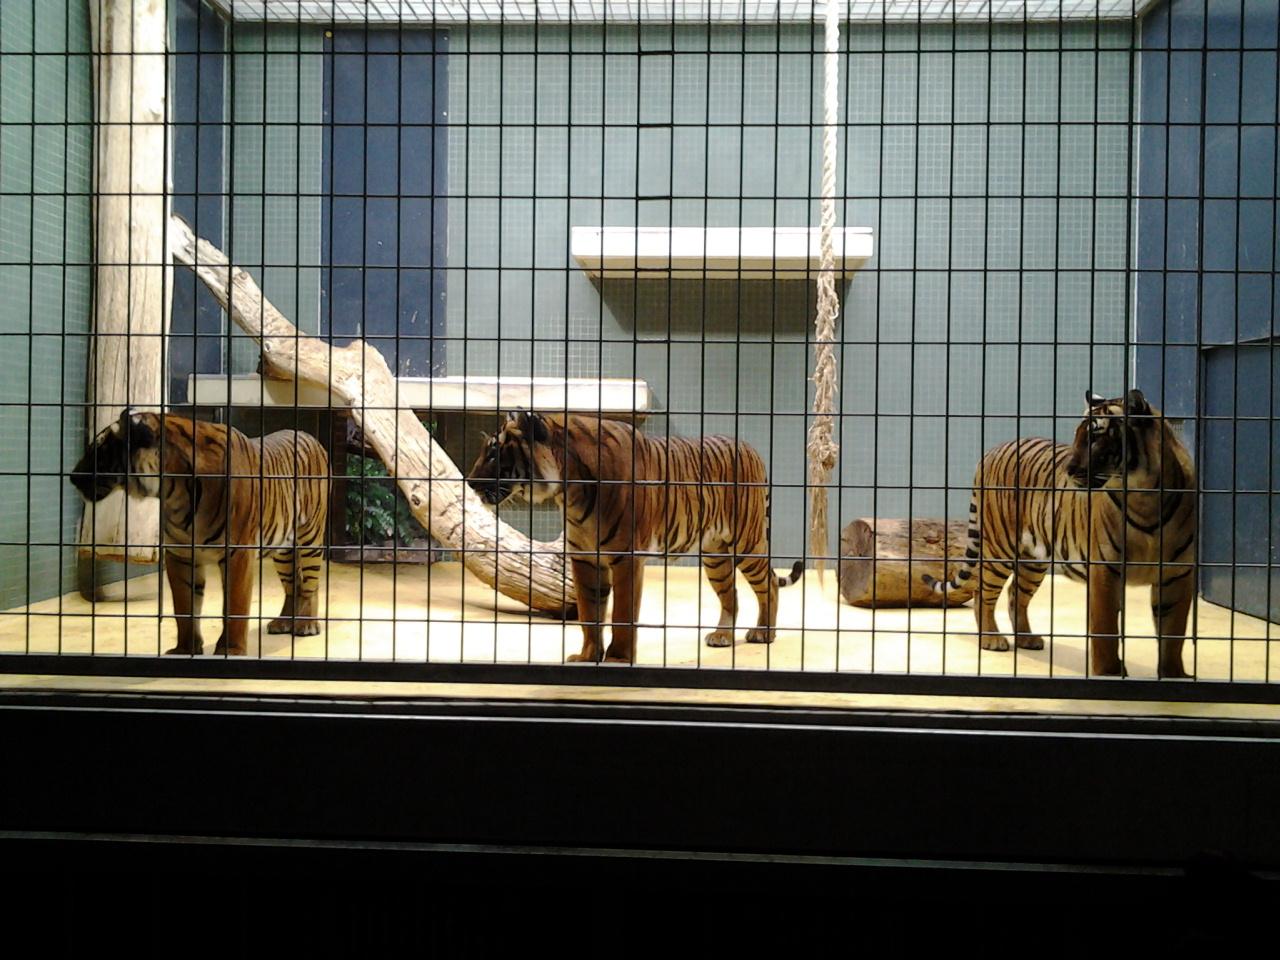 Tiger im Zoo Berlin